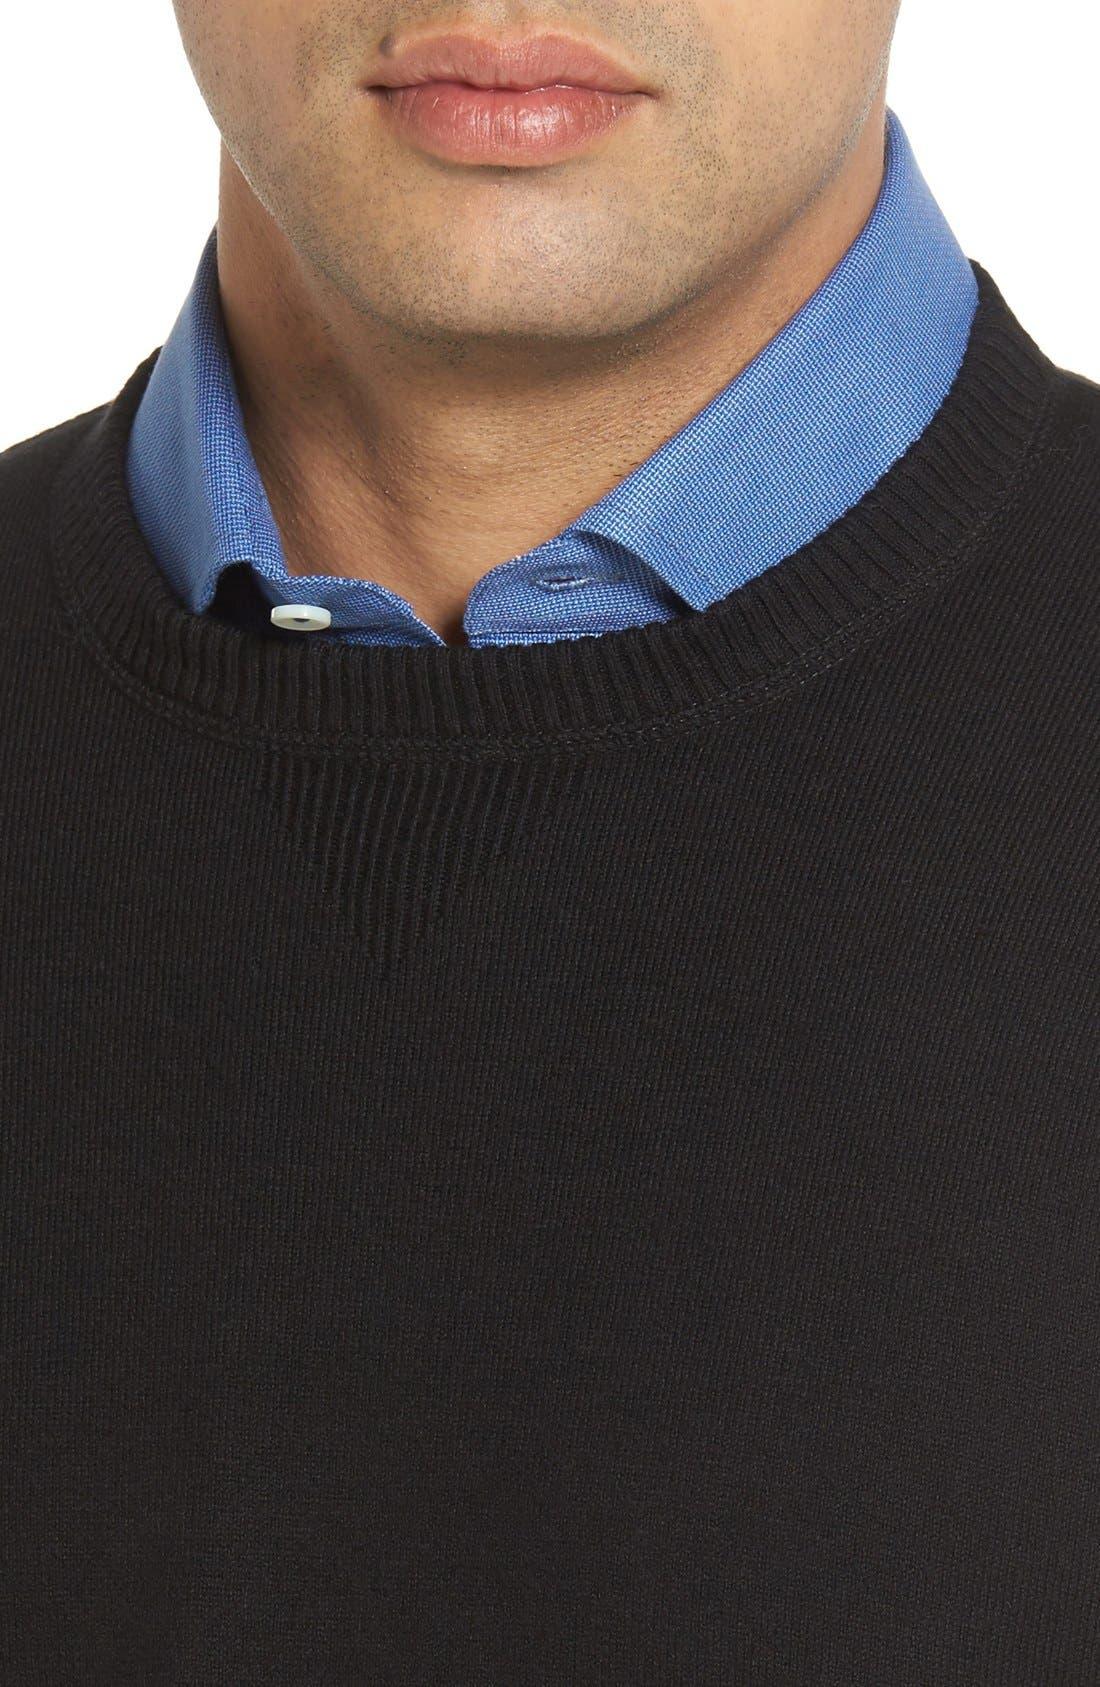 Alternate Image 4  - Robert Talbott 'Jersey Sport' Cotton Blend Crewneck Sweater